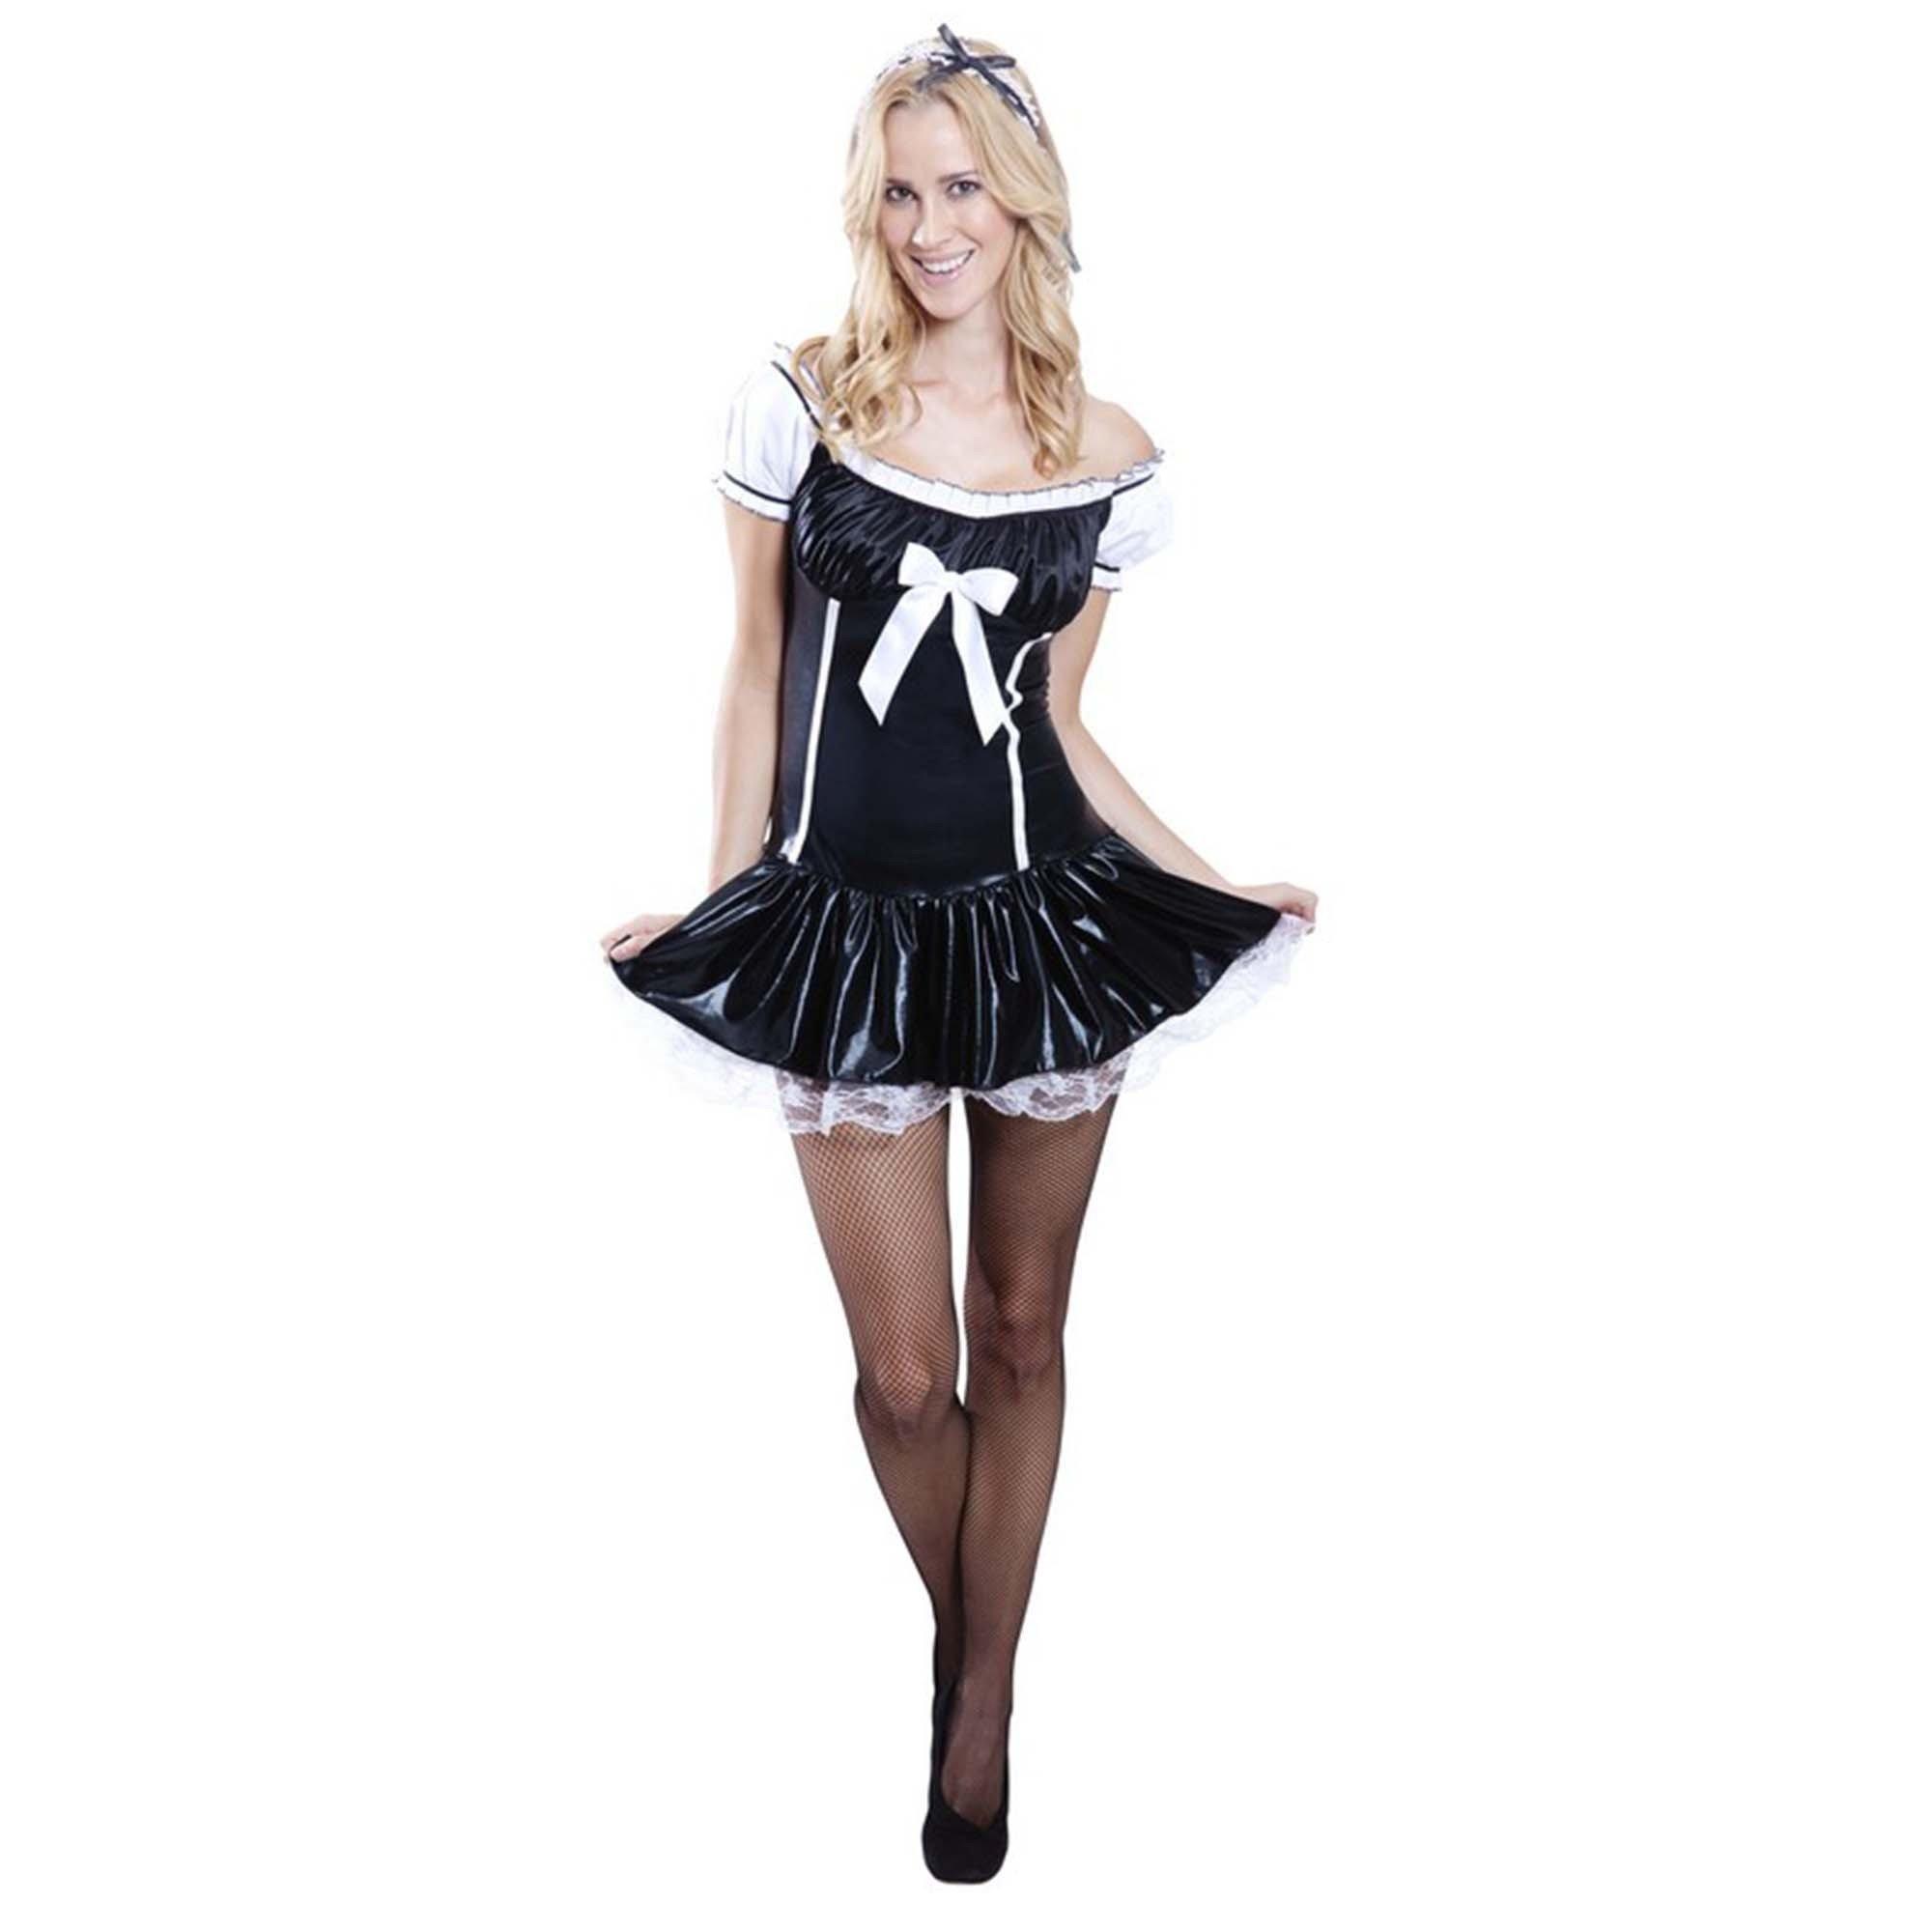 French Maid Costume (Medium)  - Adult